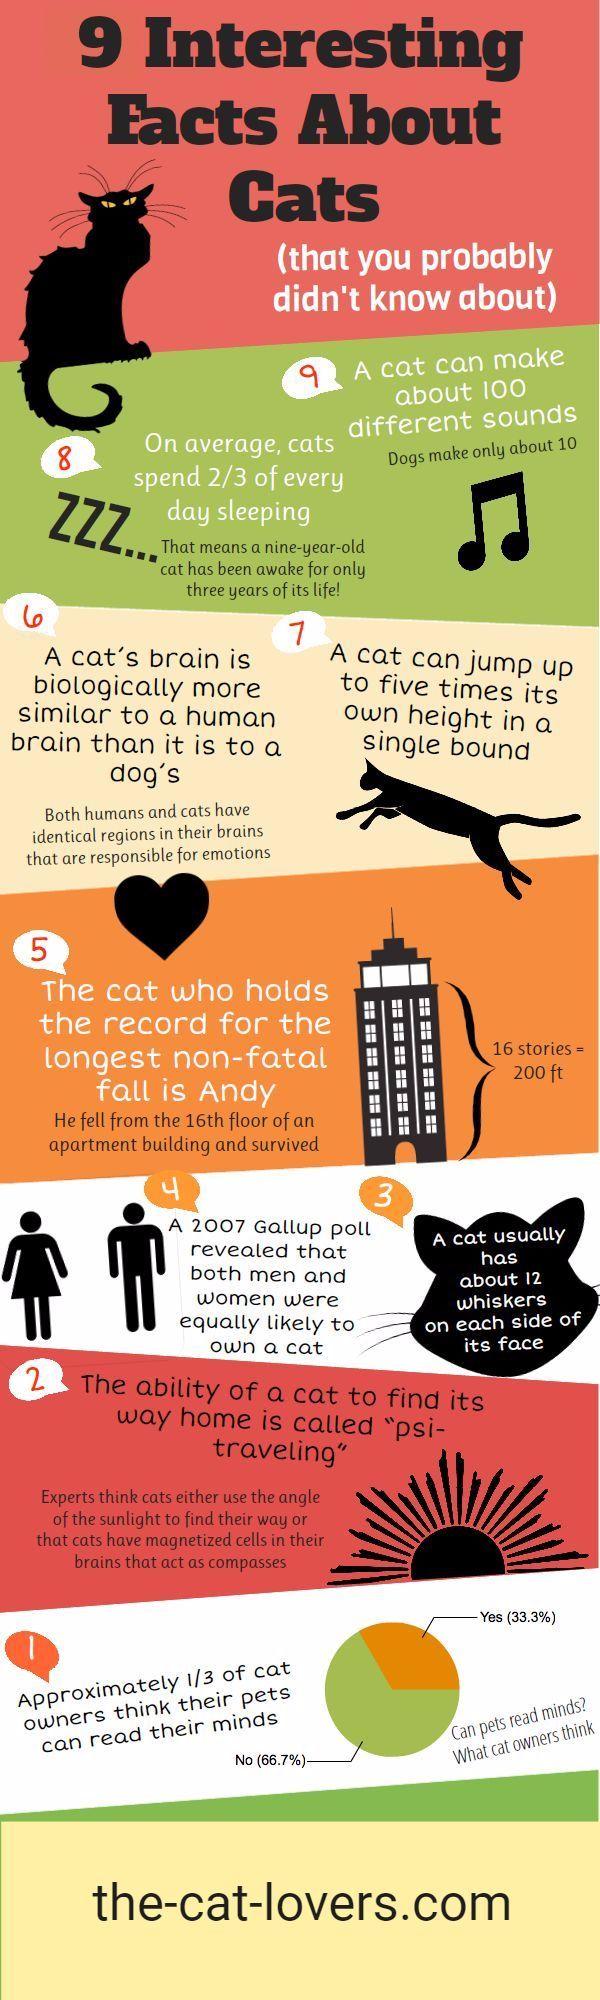 Cat Kittens Meow Cat Facts Kitten Care Fun Facts